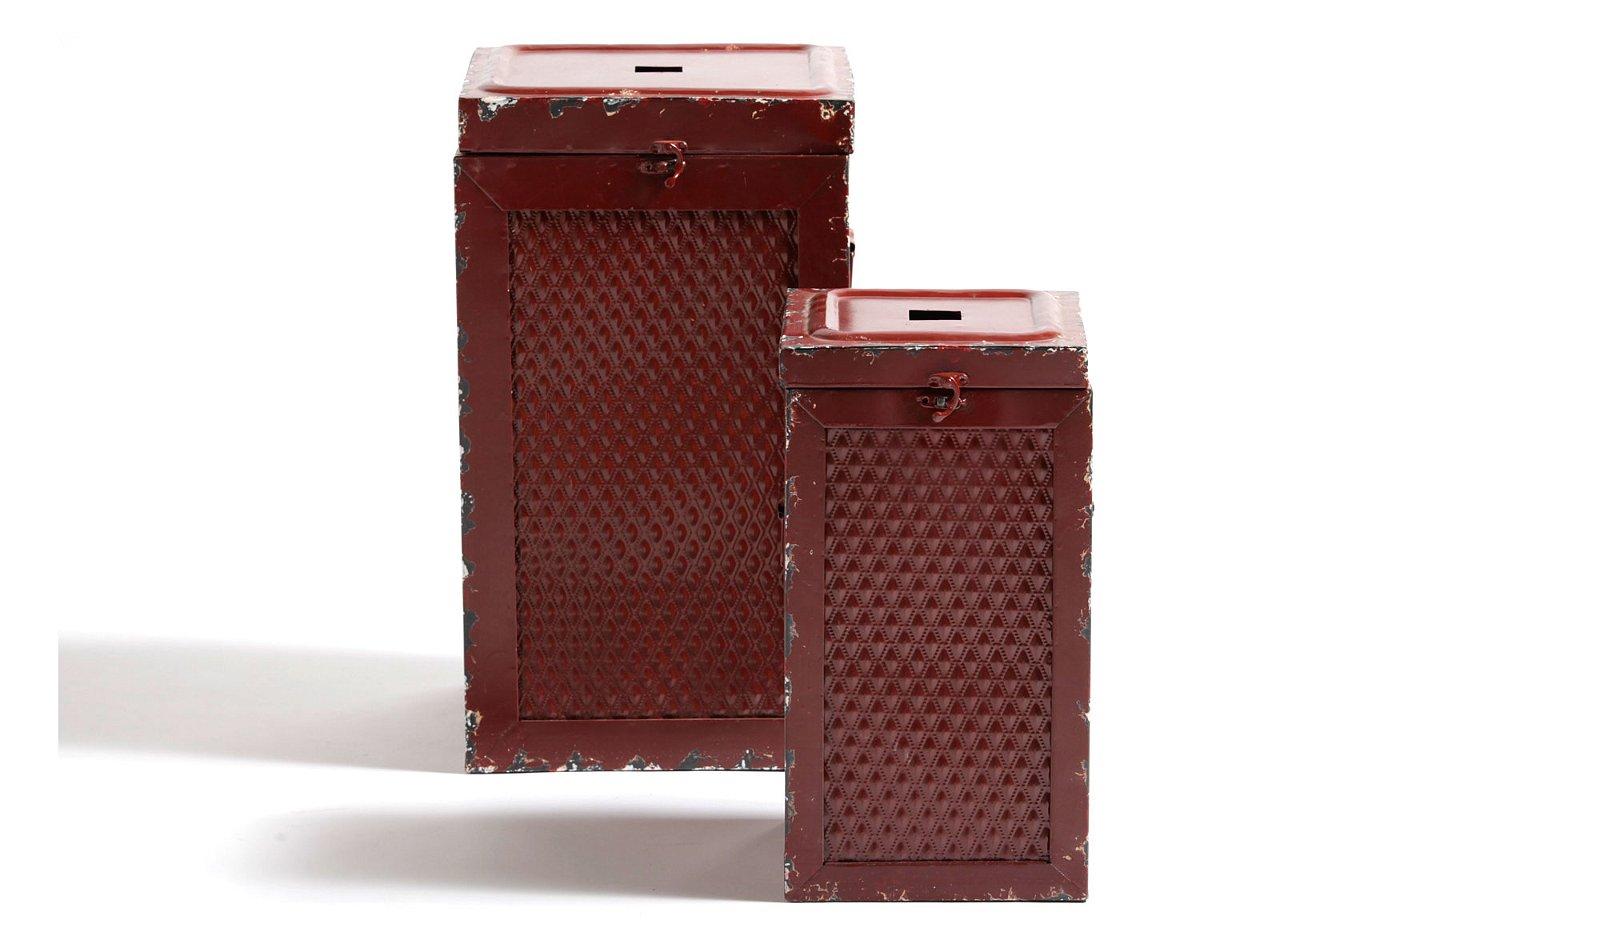 Set 2 taburetes caja rojo vintage Antique